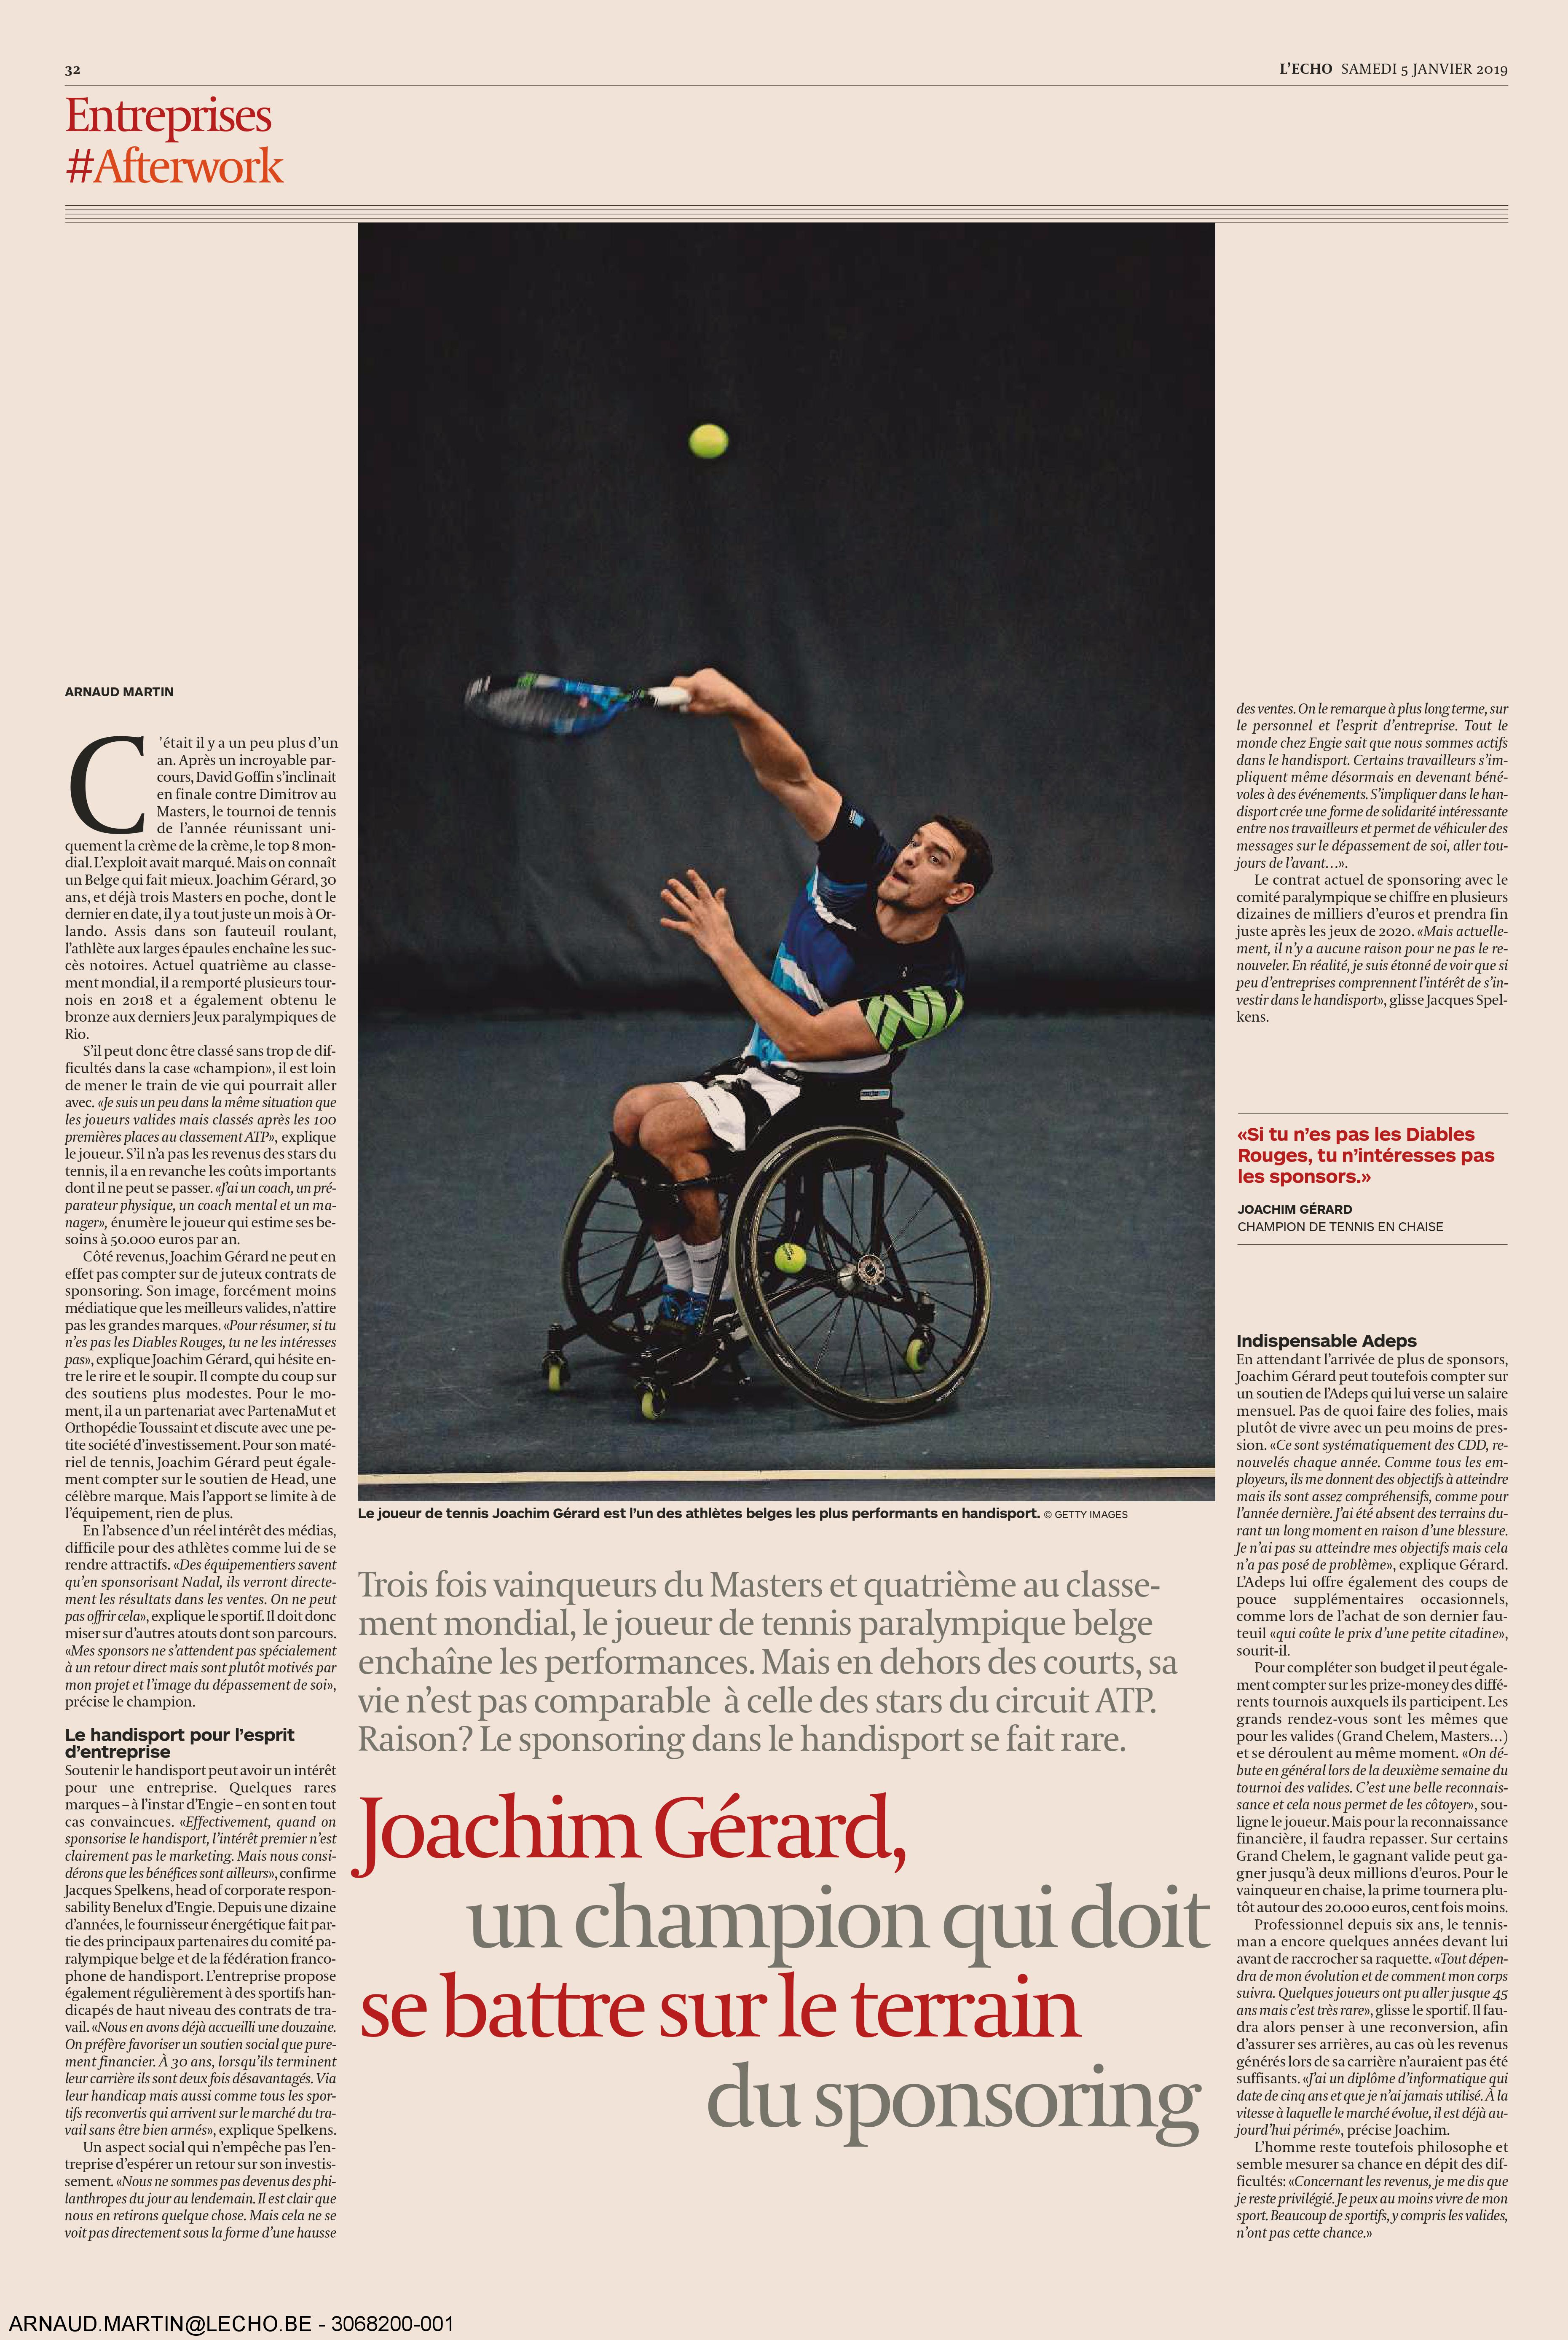 Orthopedie-Toussaint-Joachim-Gerard-Sponsoring-Handisport-Journal-l-Echo